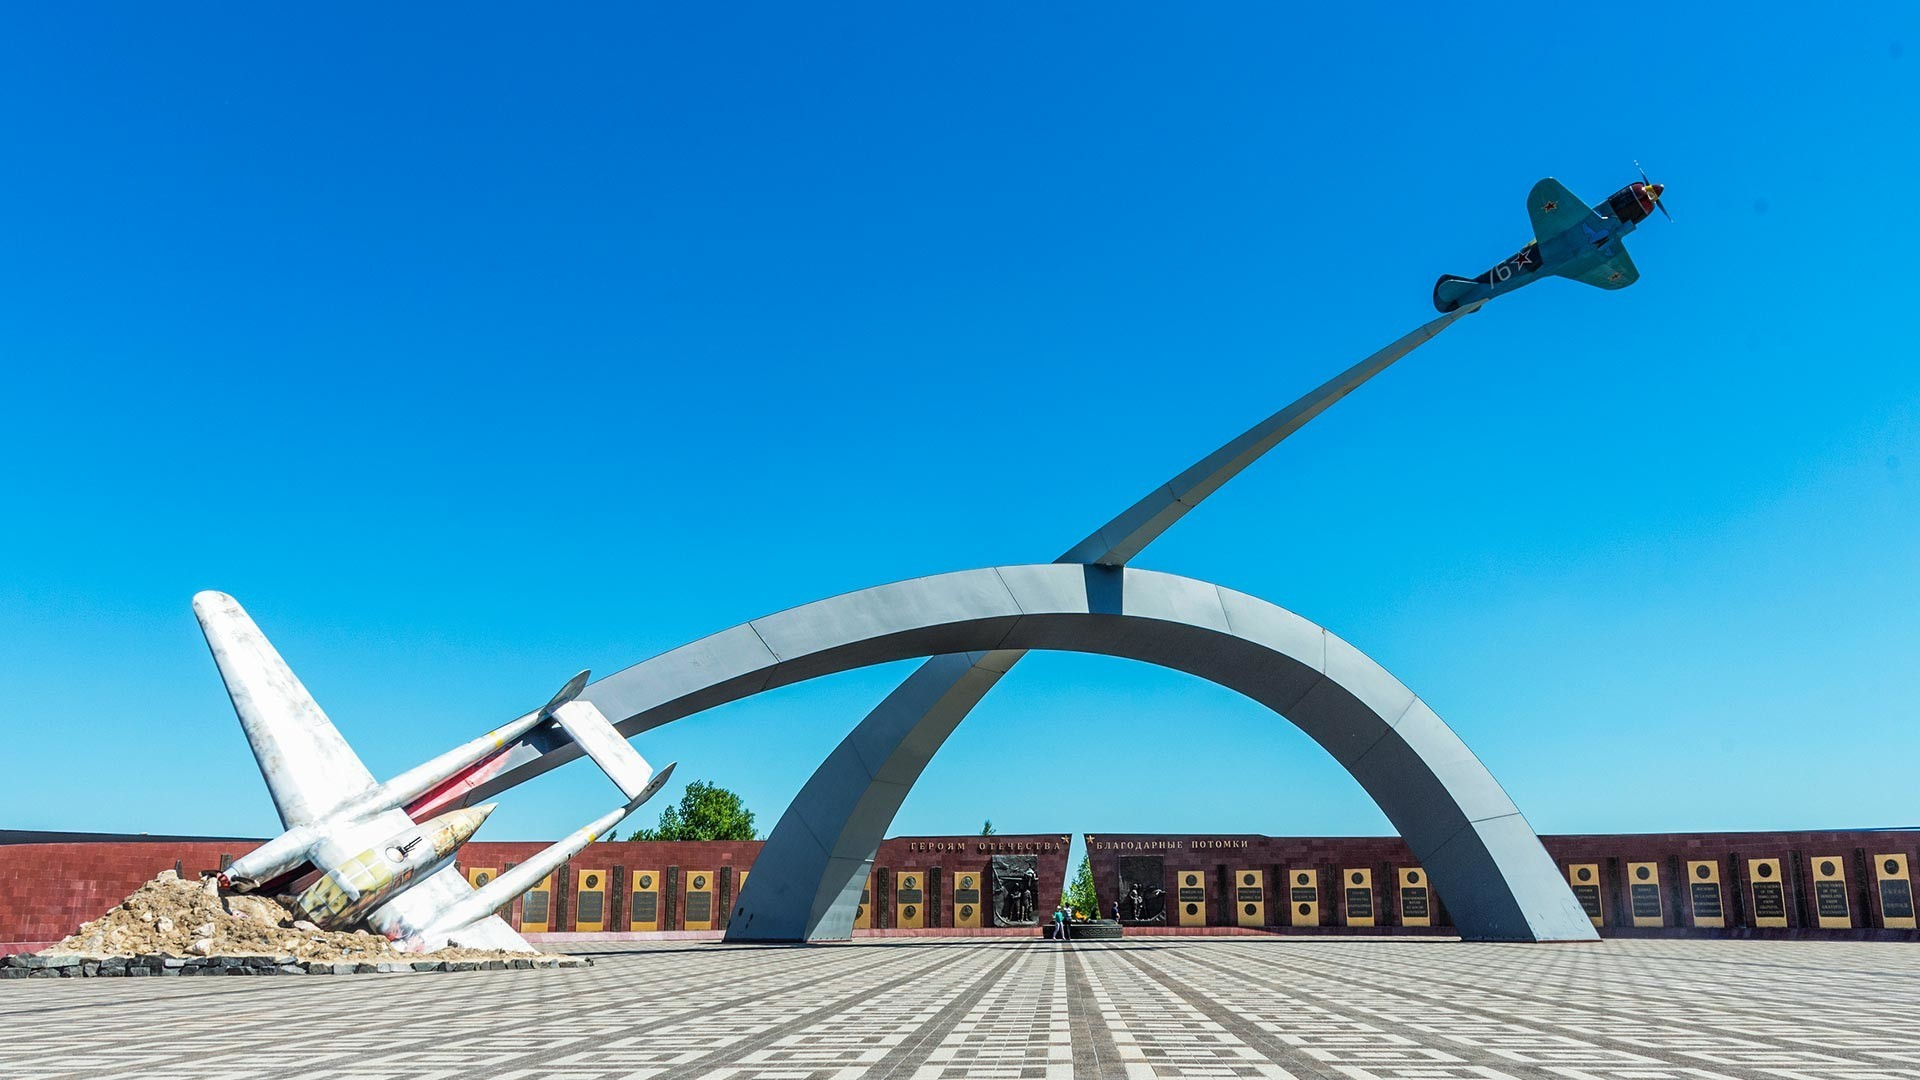 Complexo Memorial aos Defensores da Pátria